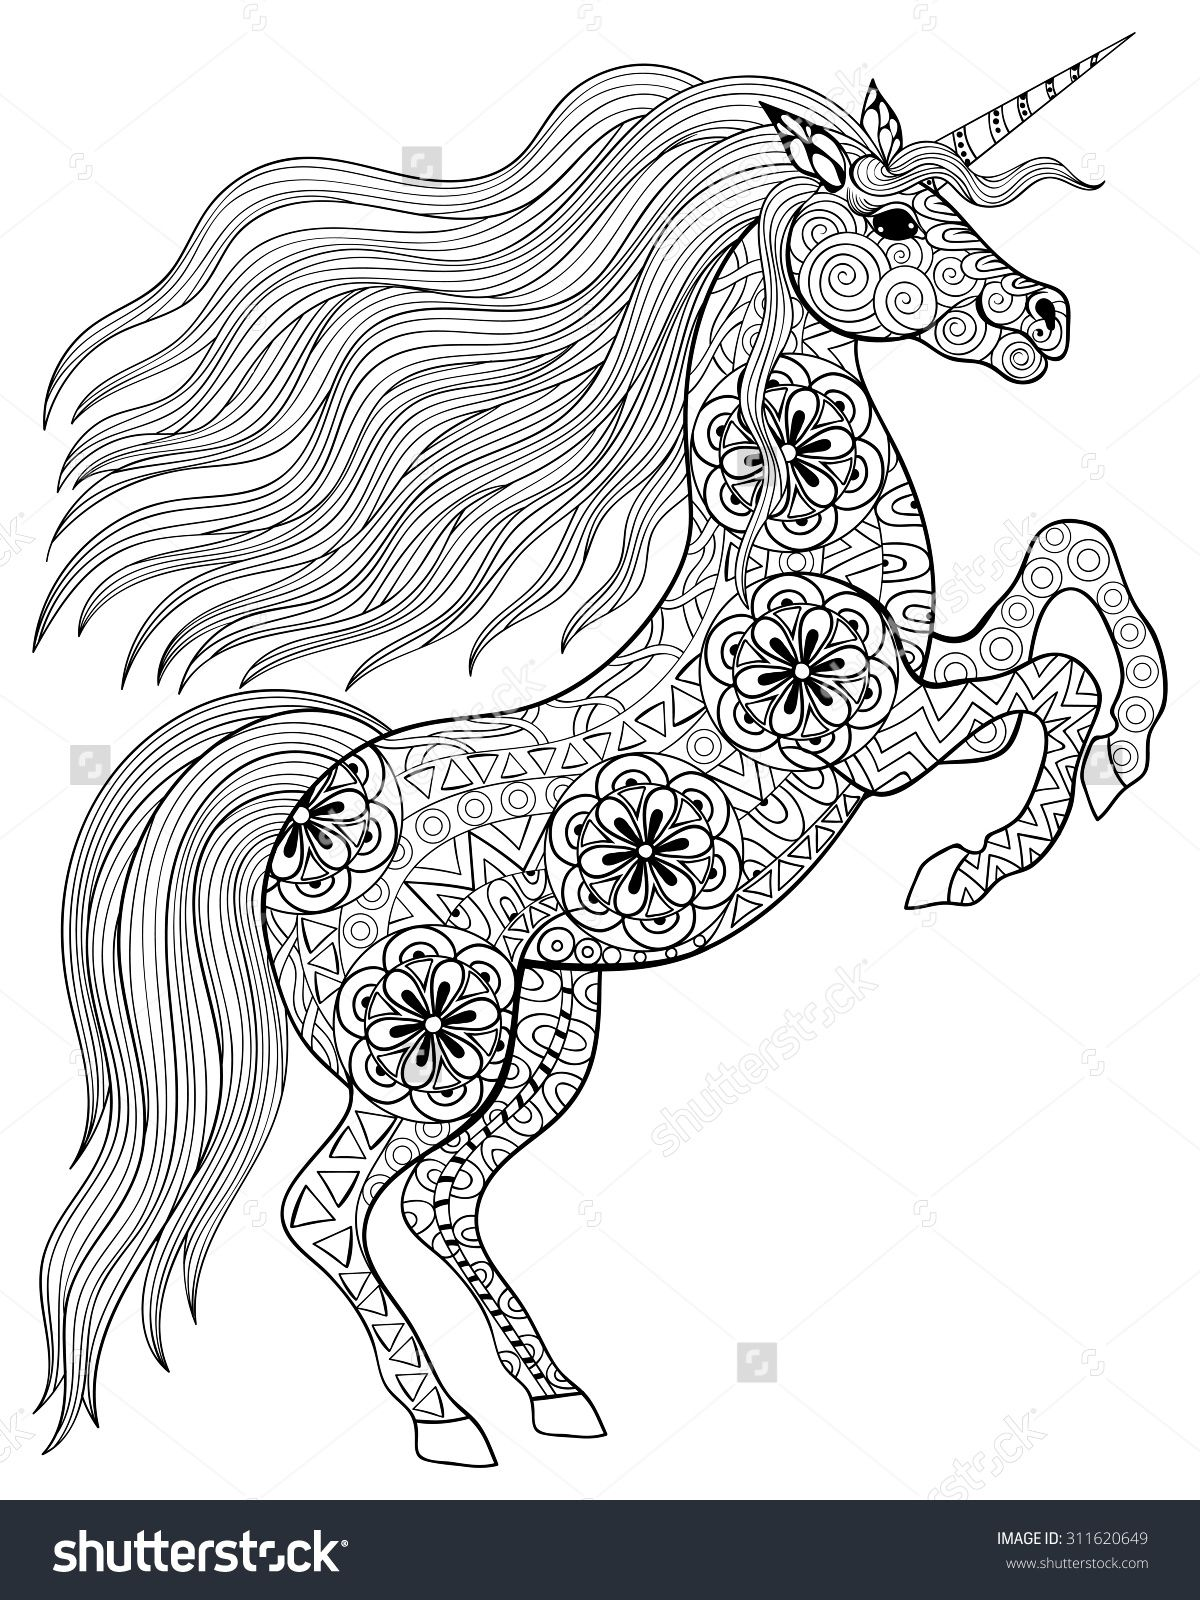 Pin By Gralyne Watkins On A Pets Unicorn Coloring Pages Animal Coloring Pages Antistress Coloring